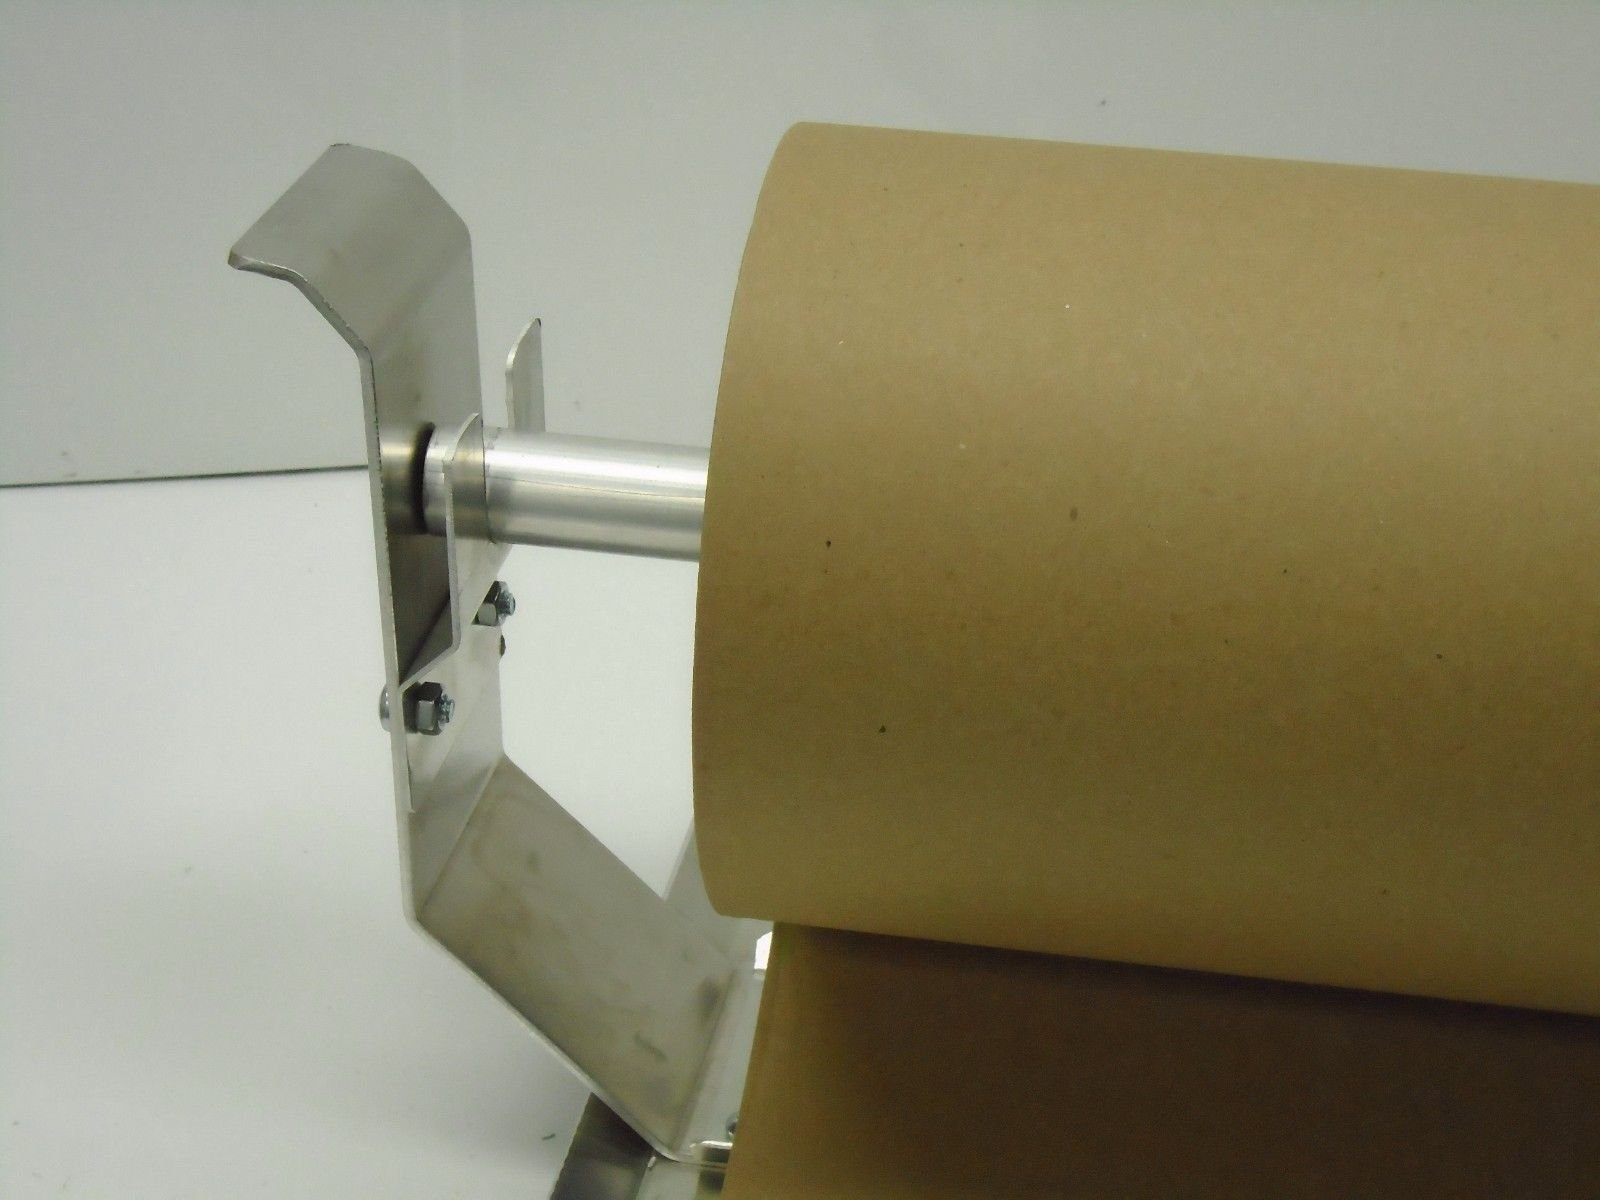 Paper Cutter Roll Dispenser Econoline 18 inches table mount Kraft paper Duralov by Duralov (Image #3)